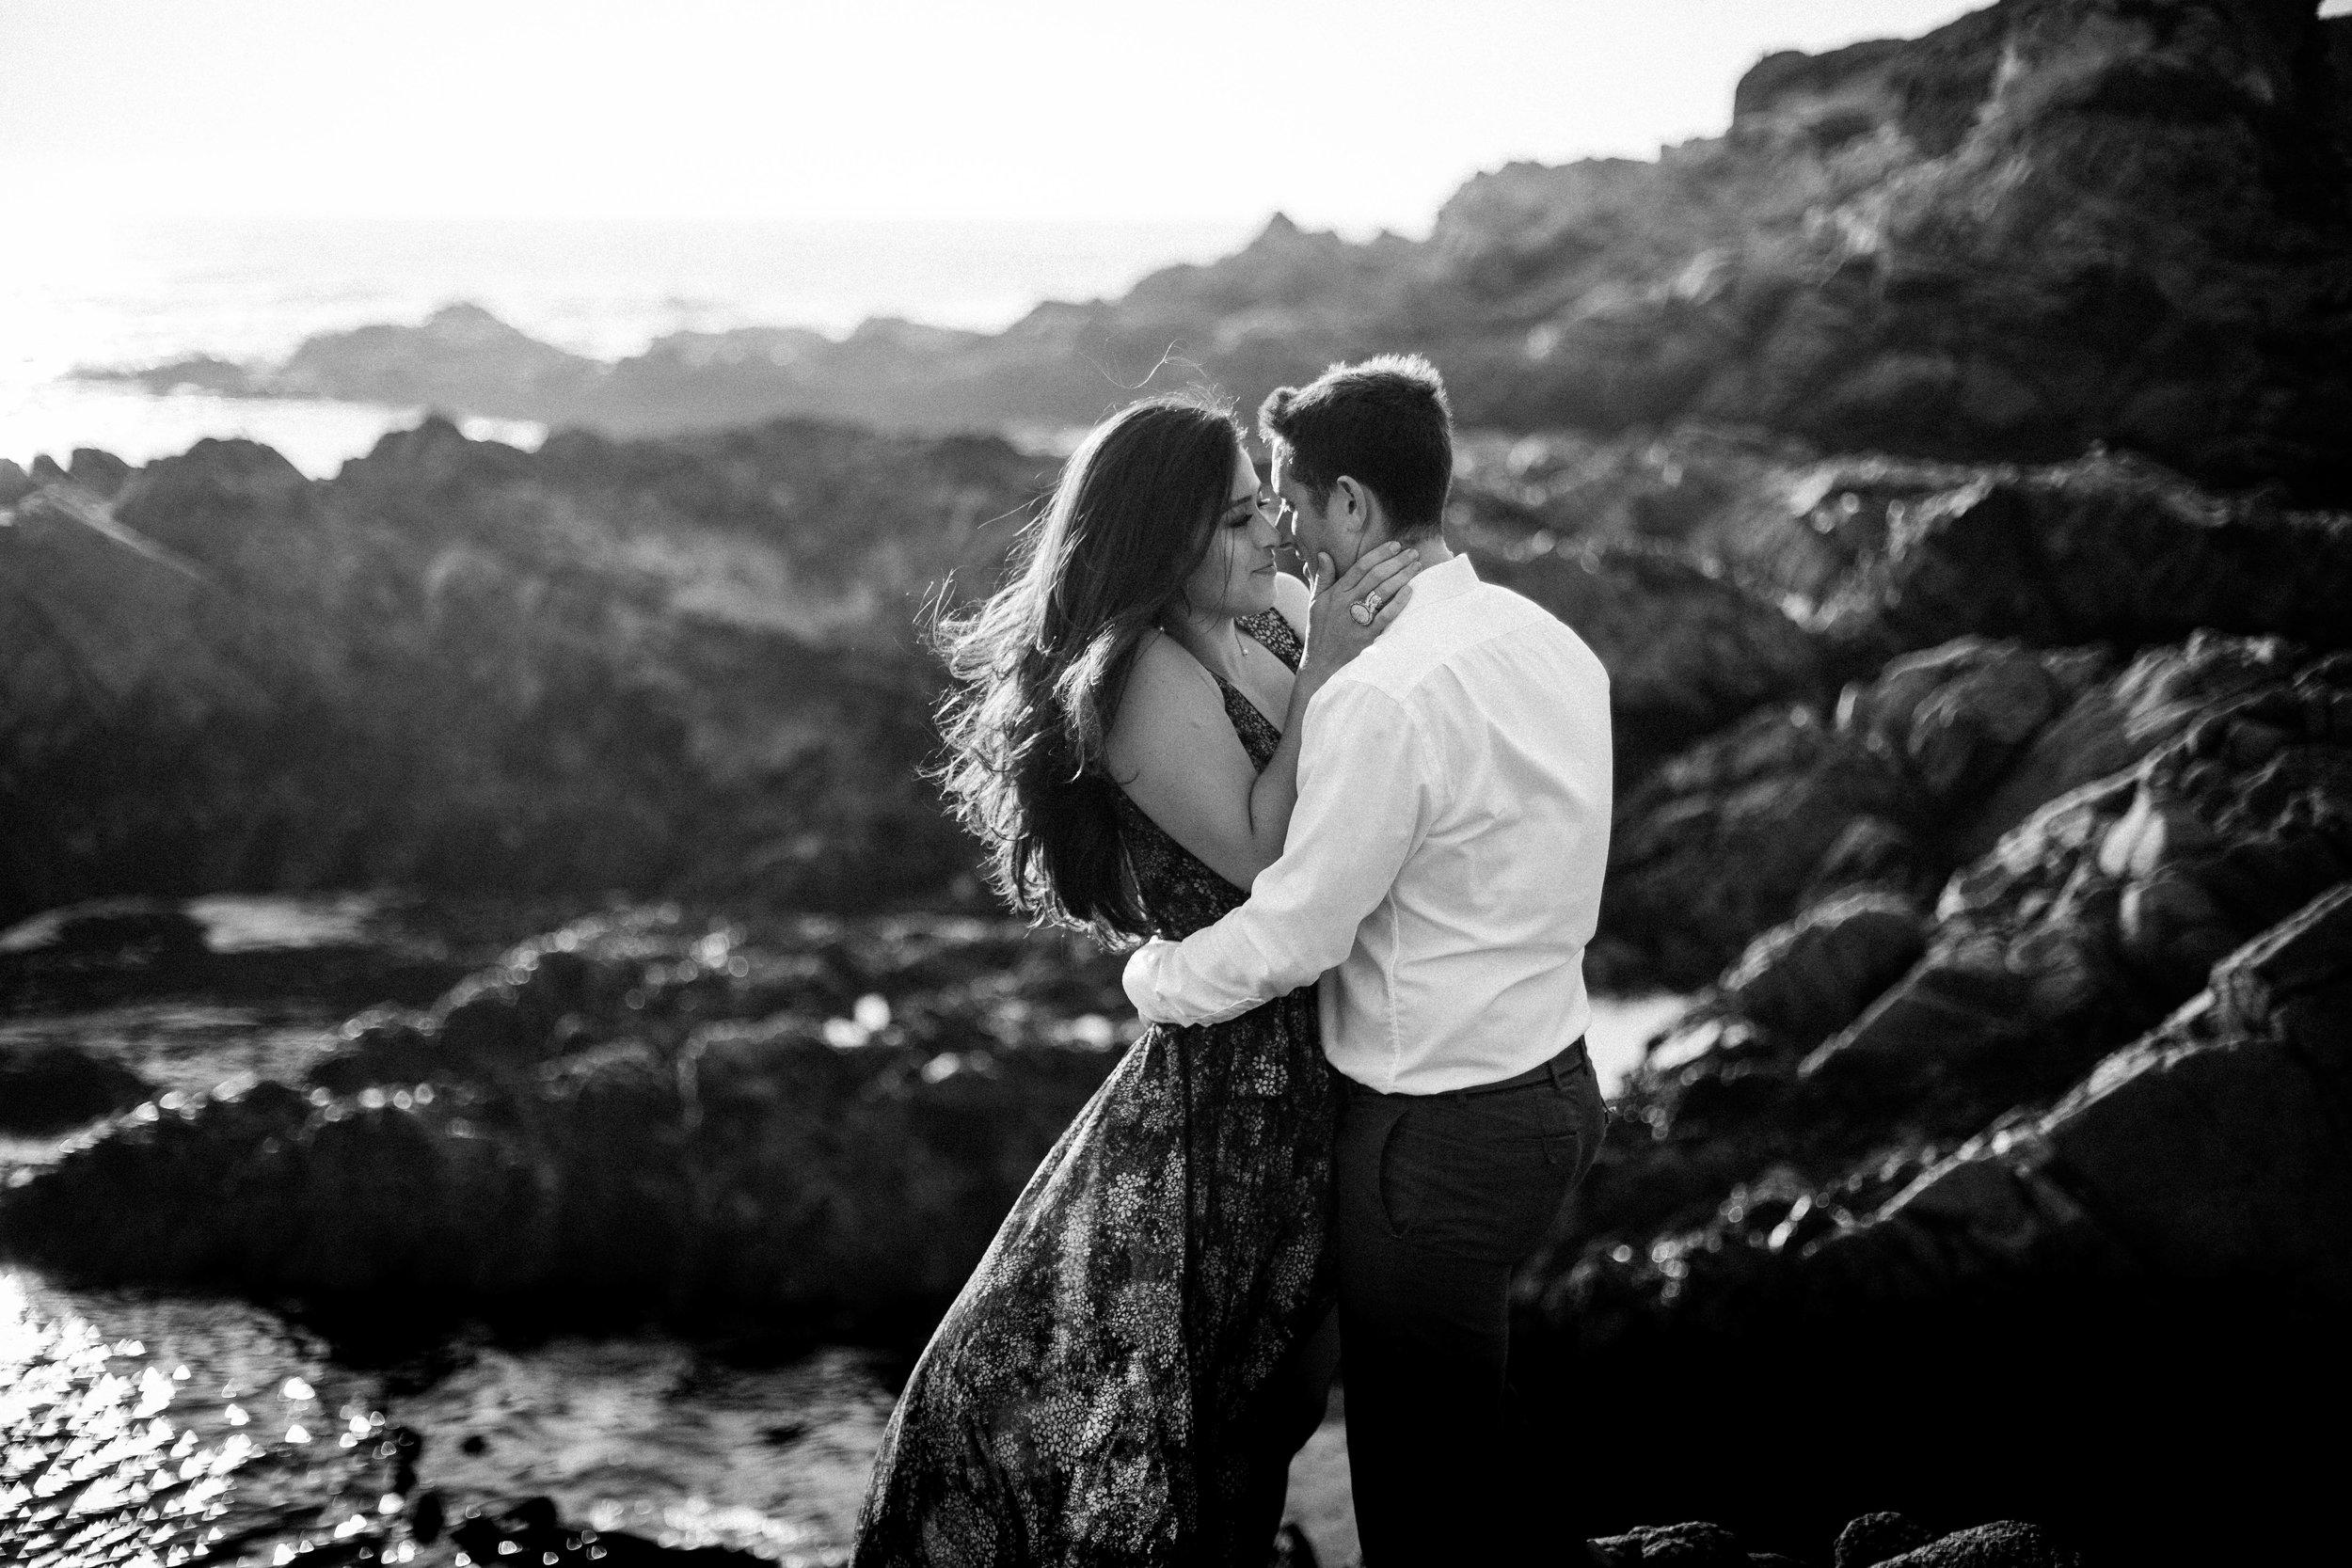 nicole-daacke-photography-big-sur-california-coast-adventure-engagement-photos-adventurous-elopement-intimate-wedding-photographer-golden-coastal-cali-engagement-session-15.jpg